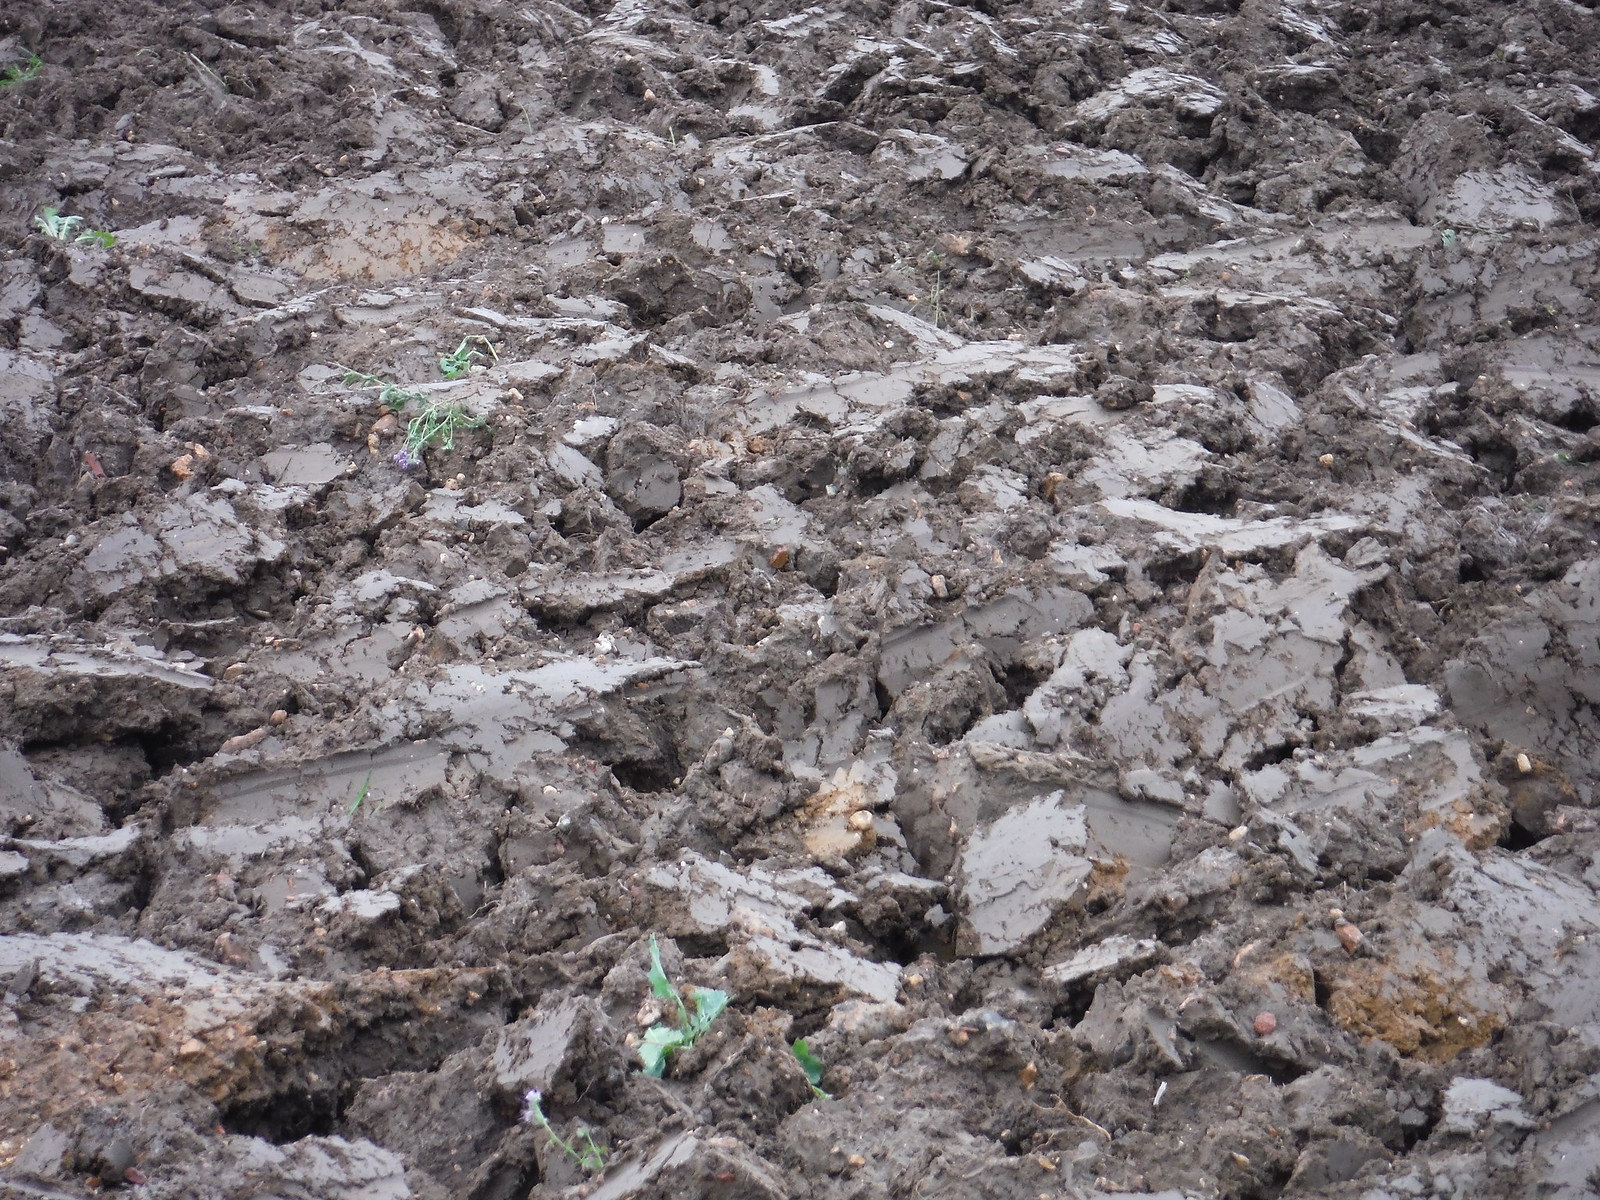 Freshly Ploughed Field SWC Walk 164 Roydon to Sawbridgeworth via Henry Moore Foundation